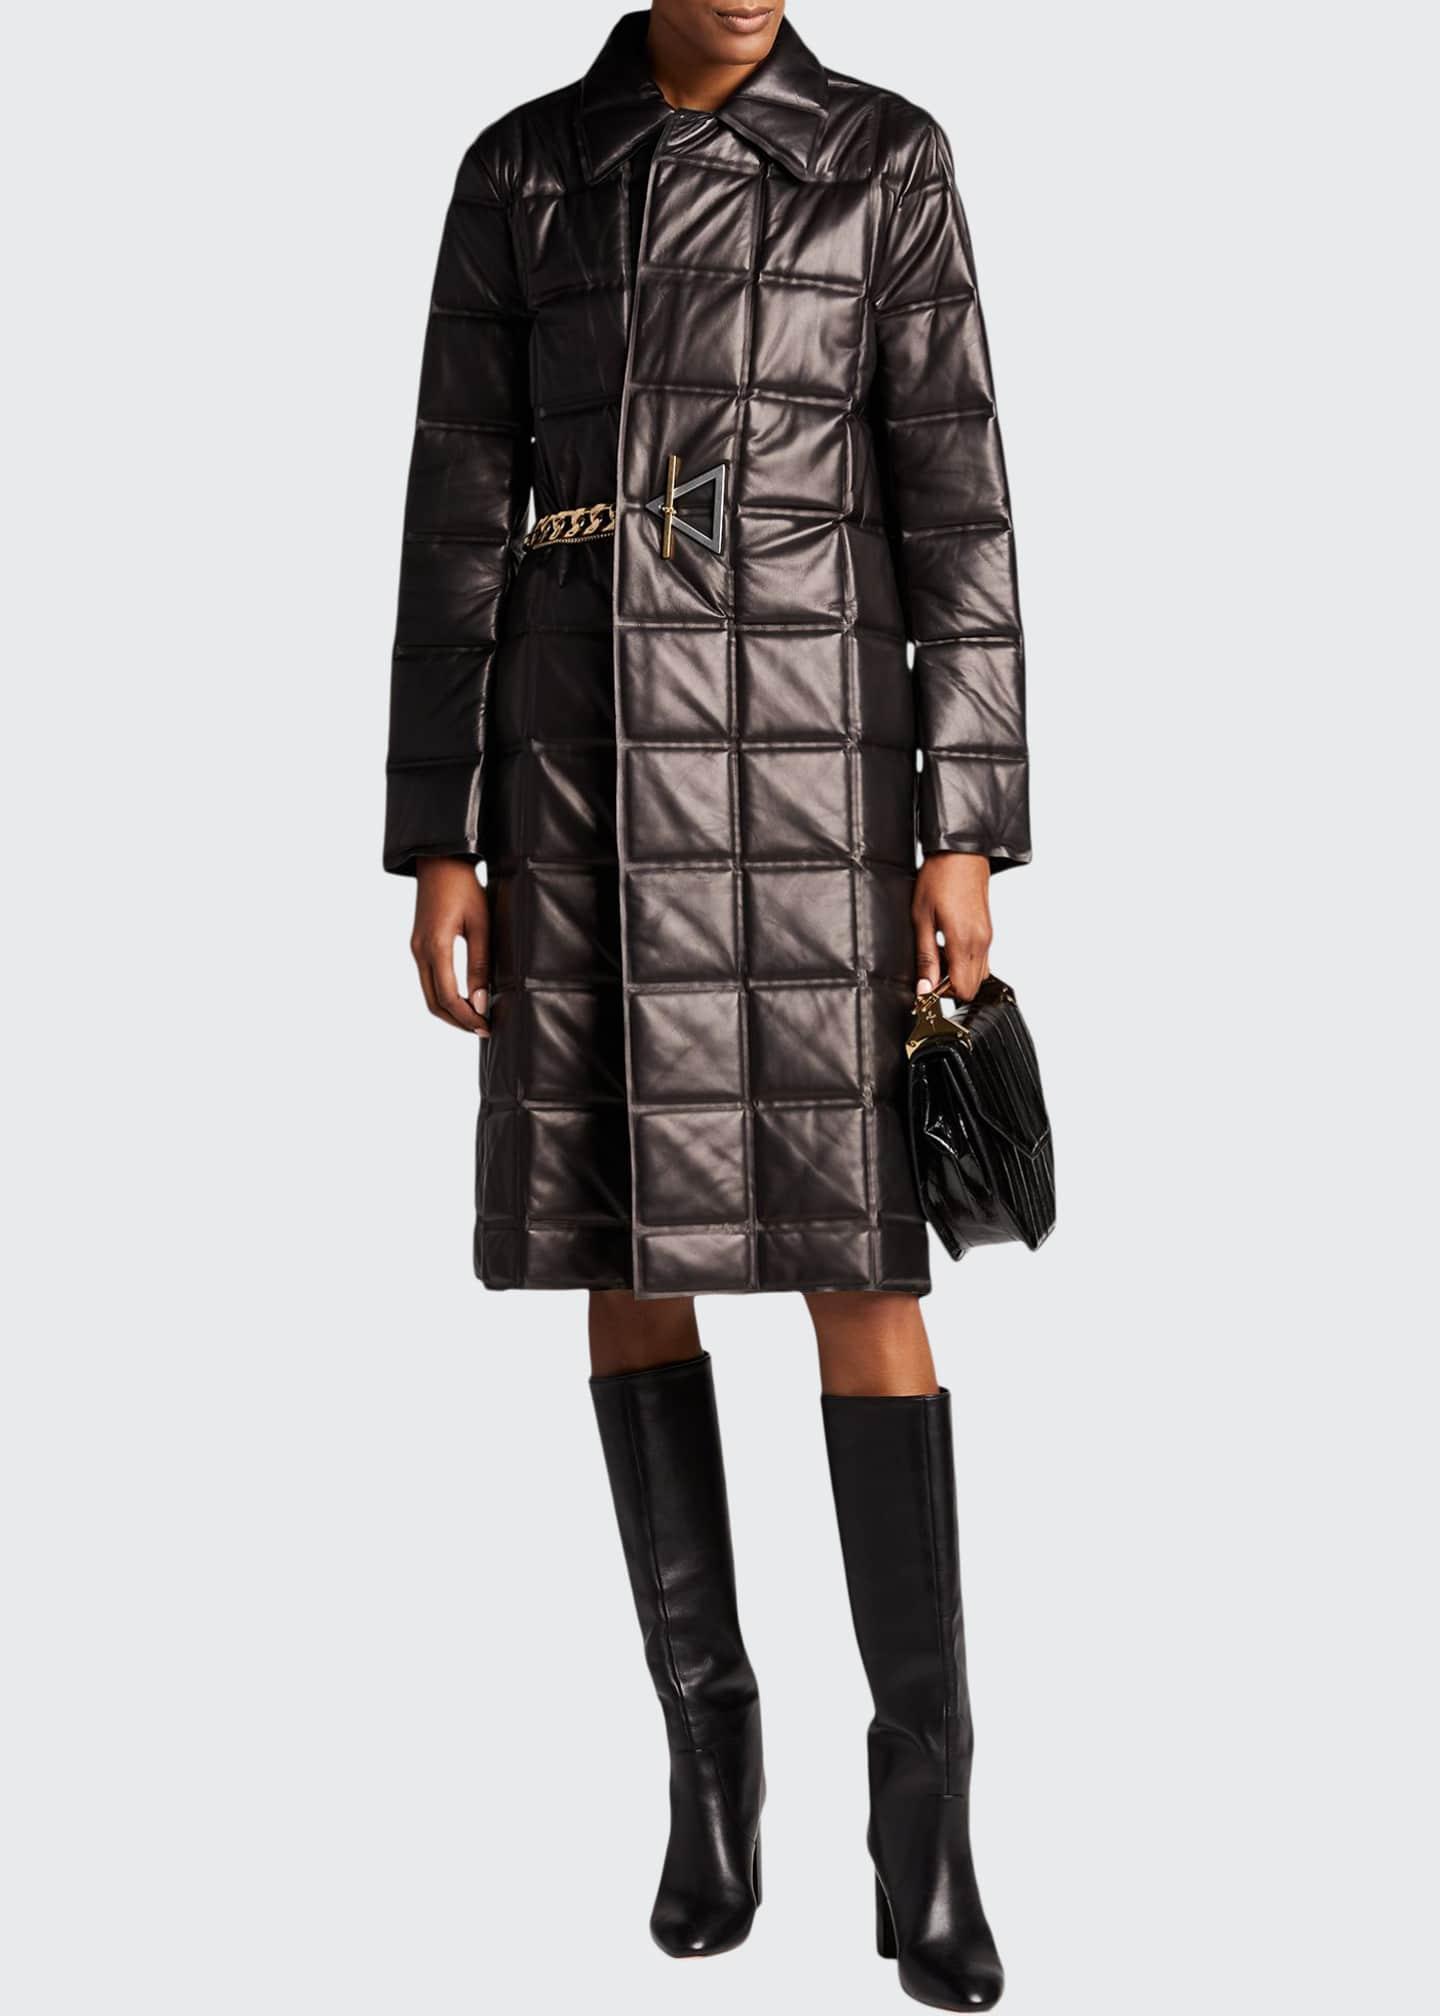 Bottega Veneta Bonded Quilted-Leather Chain-Belted Coat